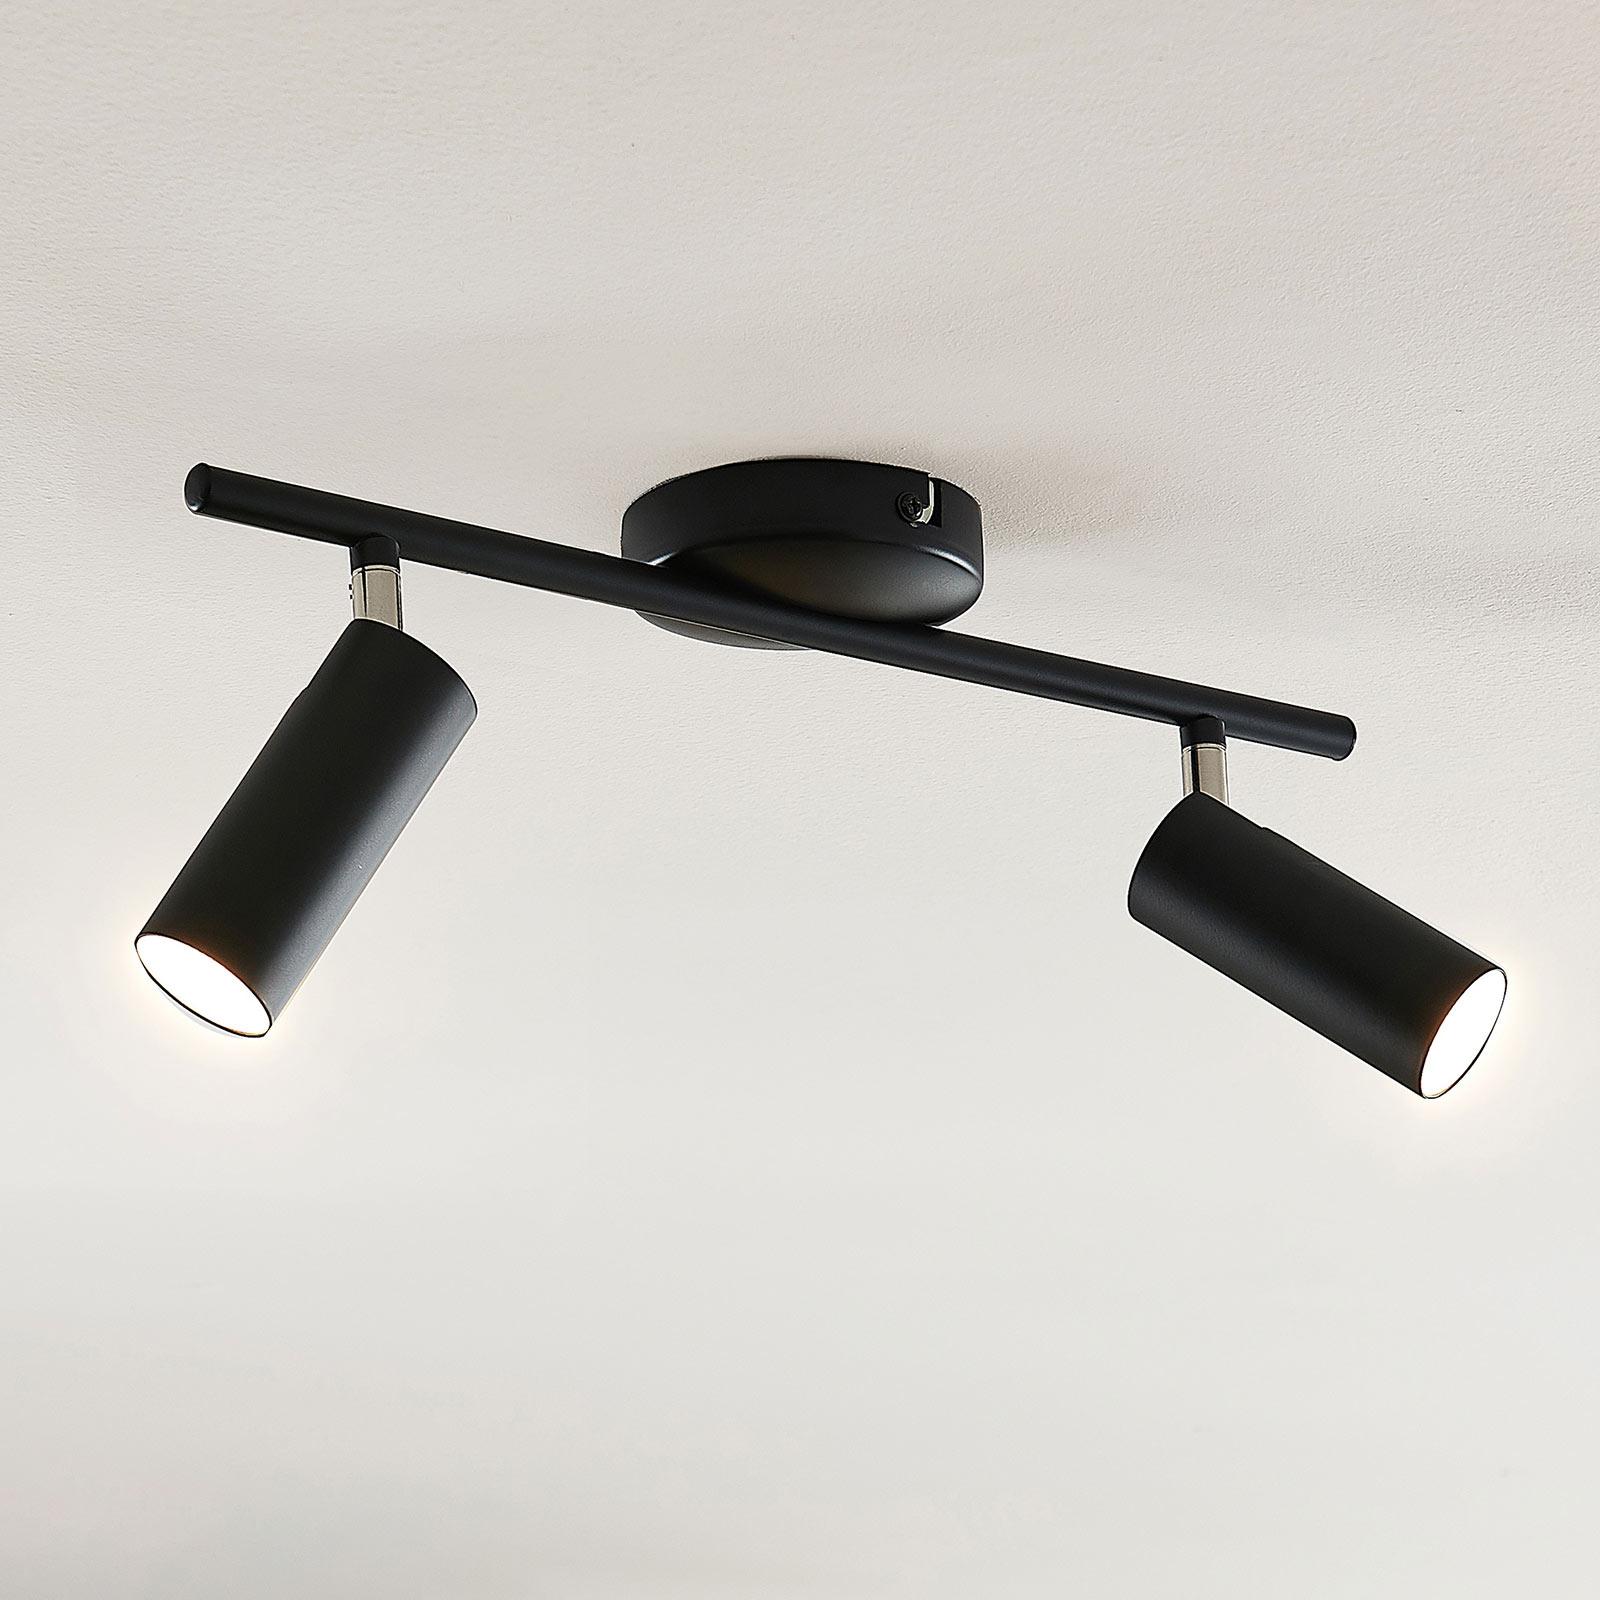 Lampa sufitowa LED Camille czarna, 2-punktowa